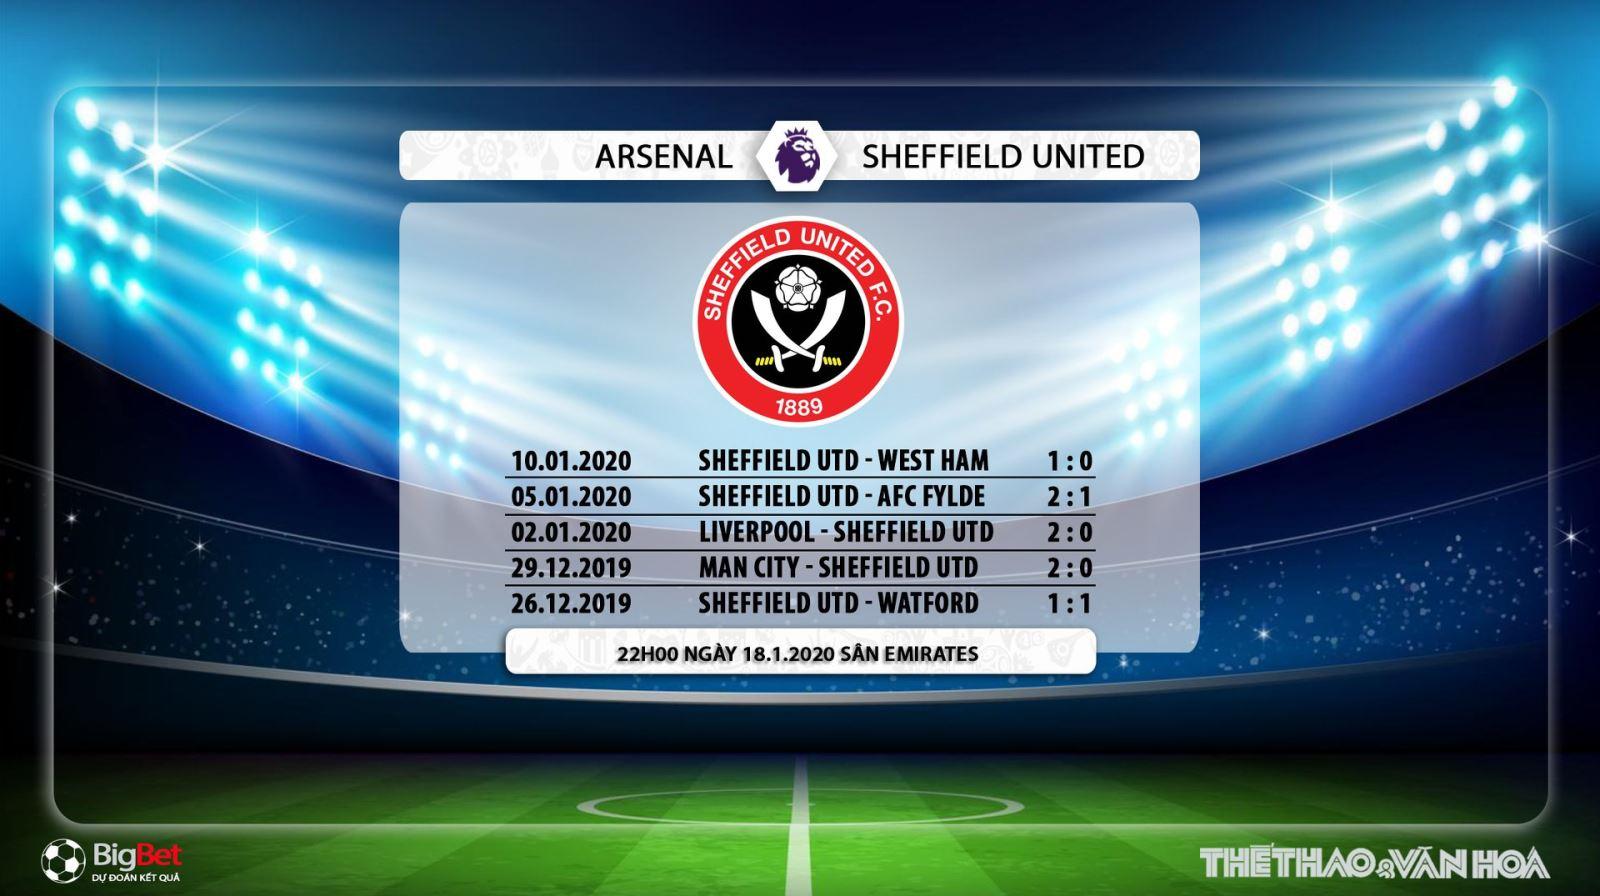 Soi kèo Arsenal vs Sheffield, Arsenal vs Sheffield, trực tiếp Arsenal vs Sheffield, dự đoán Arsenal vs Sheffield, Arsenal, Sheffield, K+, K+PM